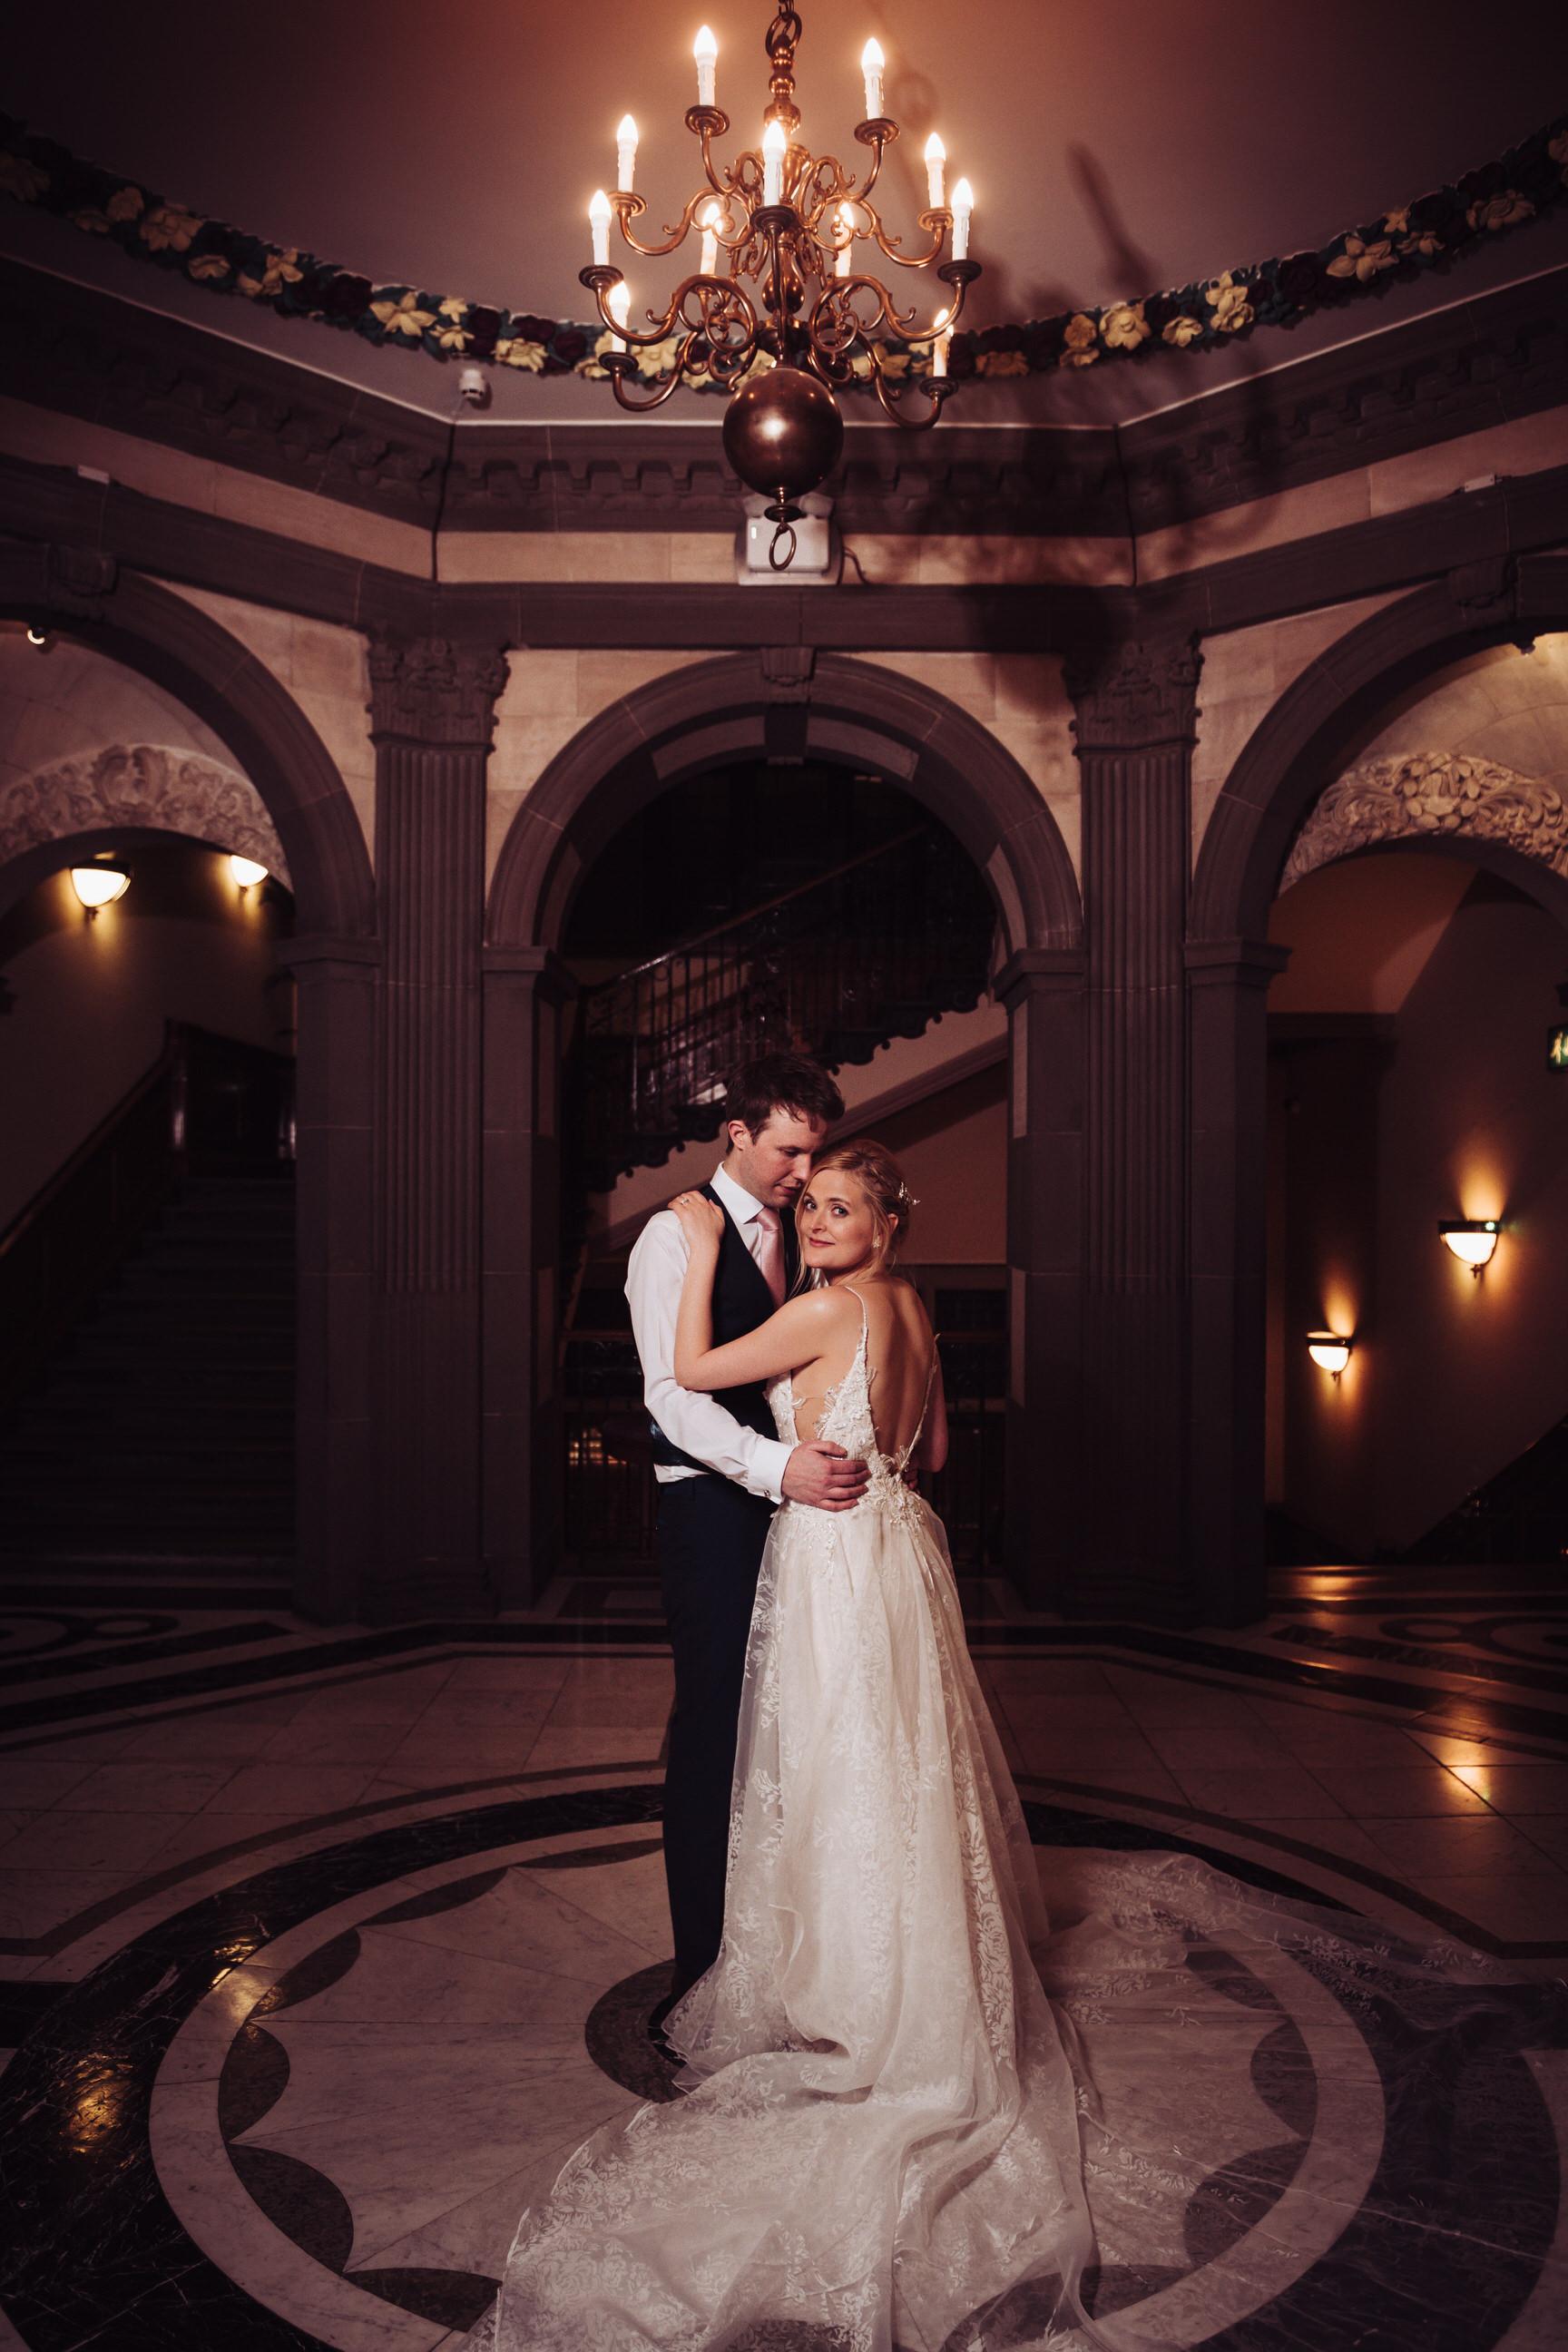 The-Grand-Hotel-York-wedding-photographer-10.jpg